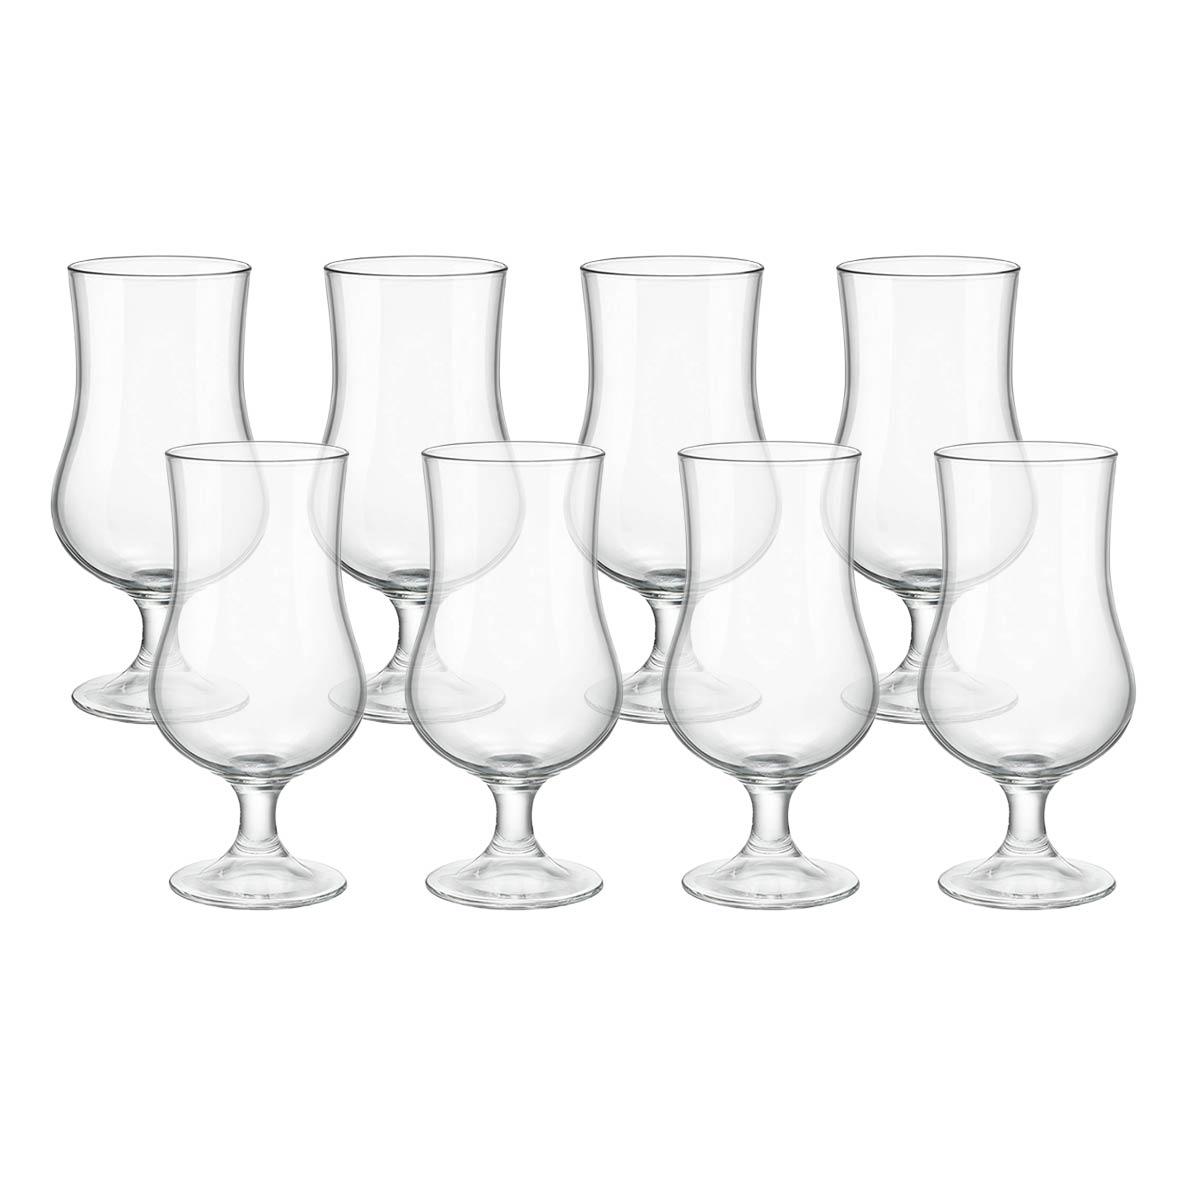 Kit 8 Taças de Vidro Transparente 420 ml  - Lemis